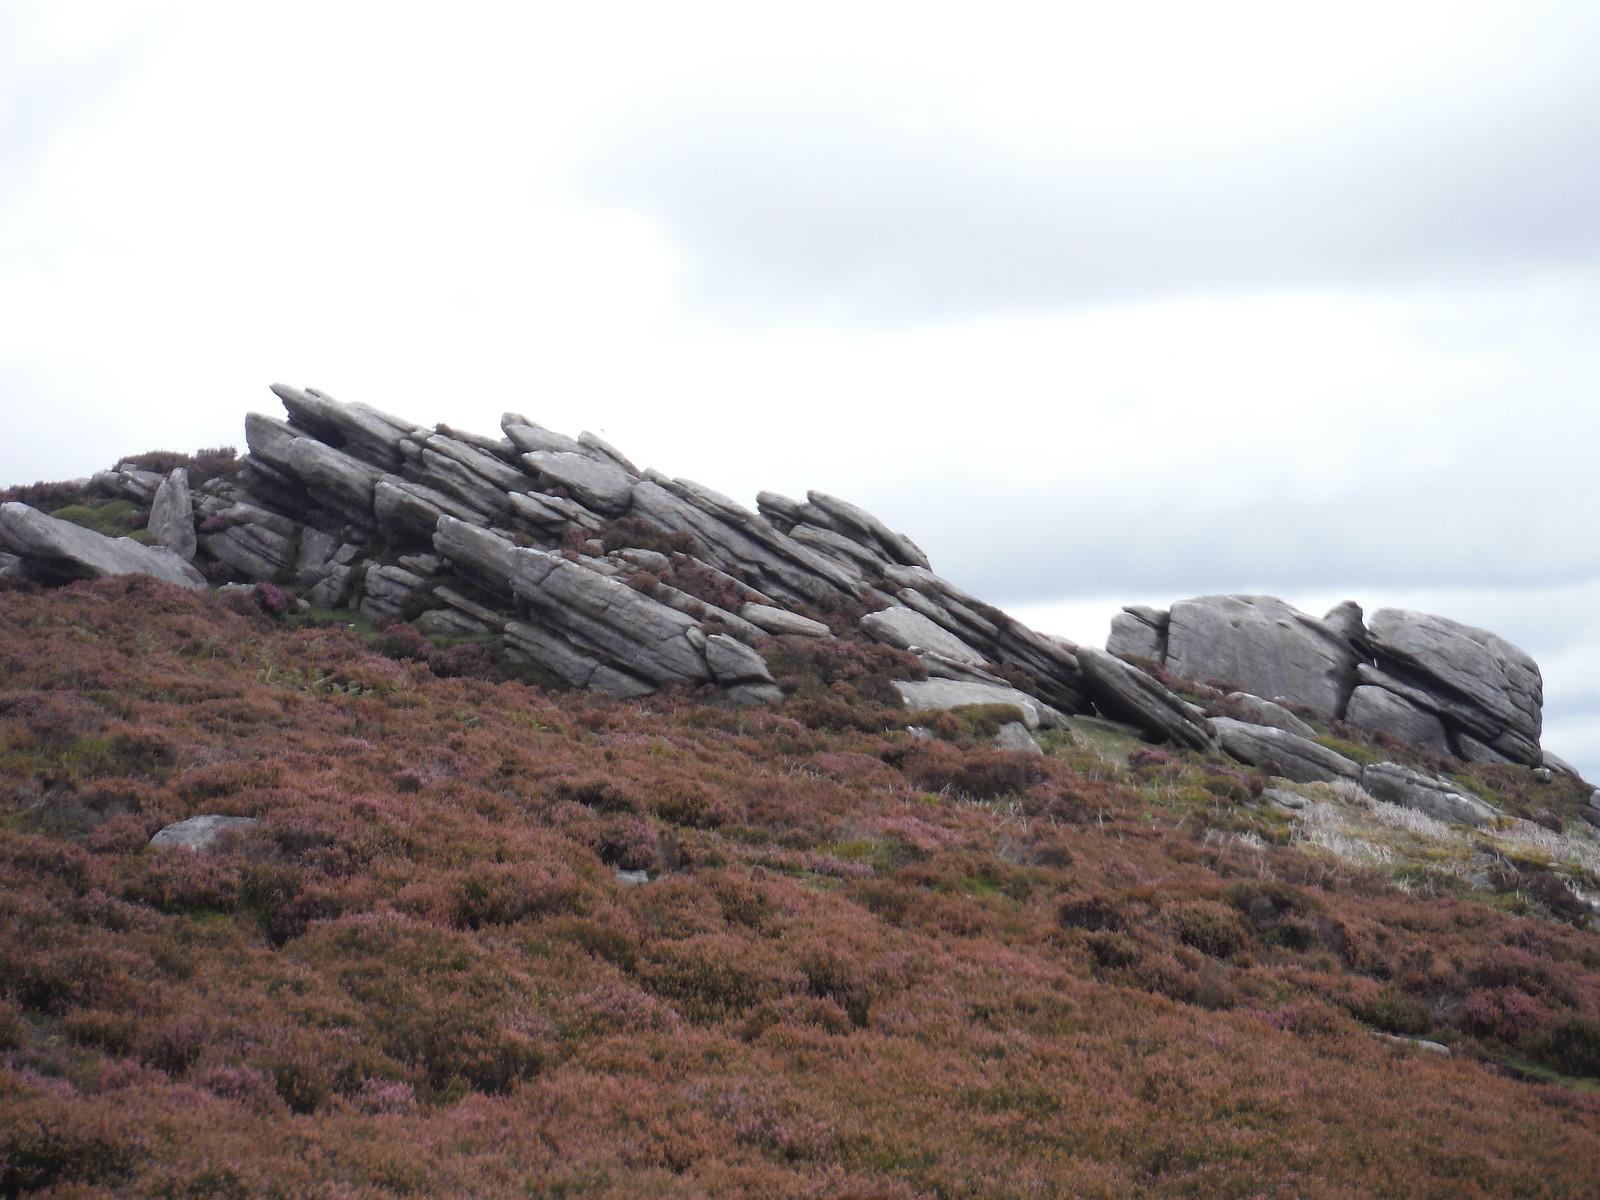 Hurkling Stones, Derwent Edge SWC Walk 348 - Ladybower Inn Circular (via Derwent Edges and Strines)